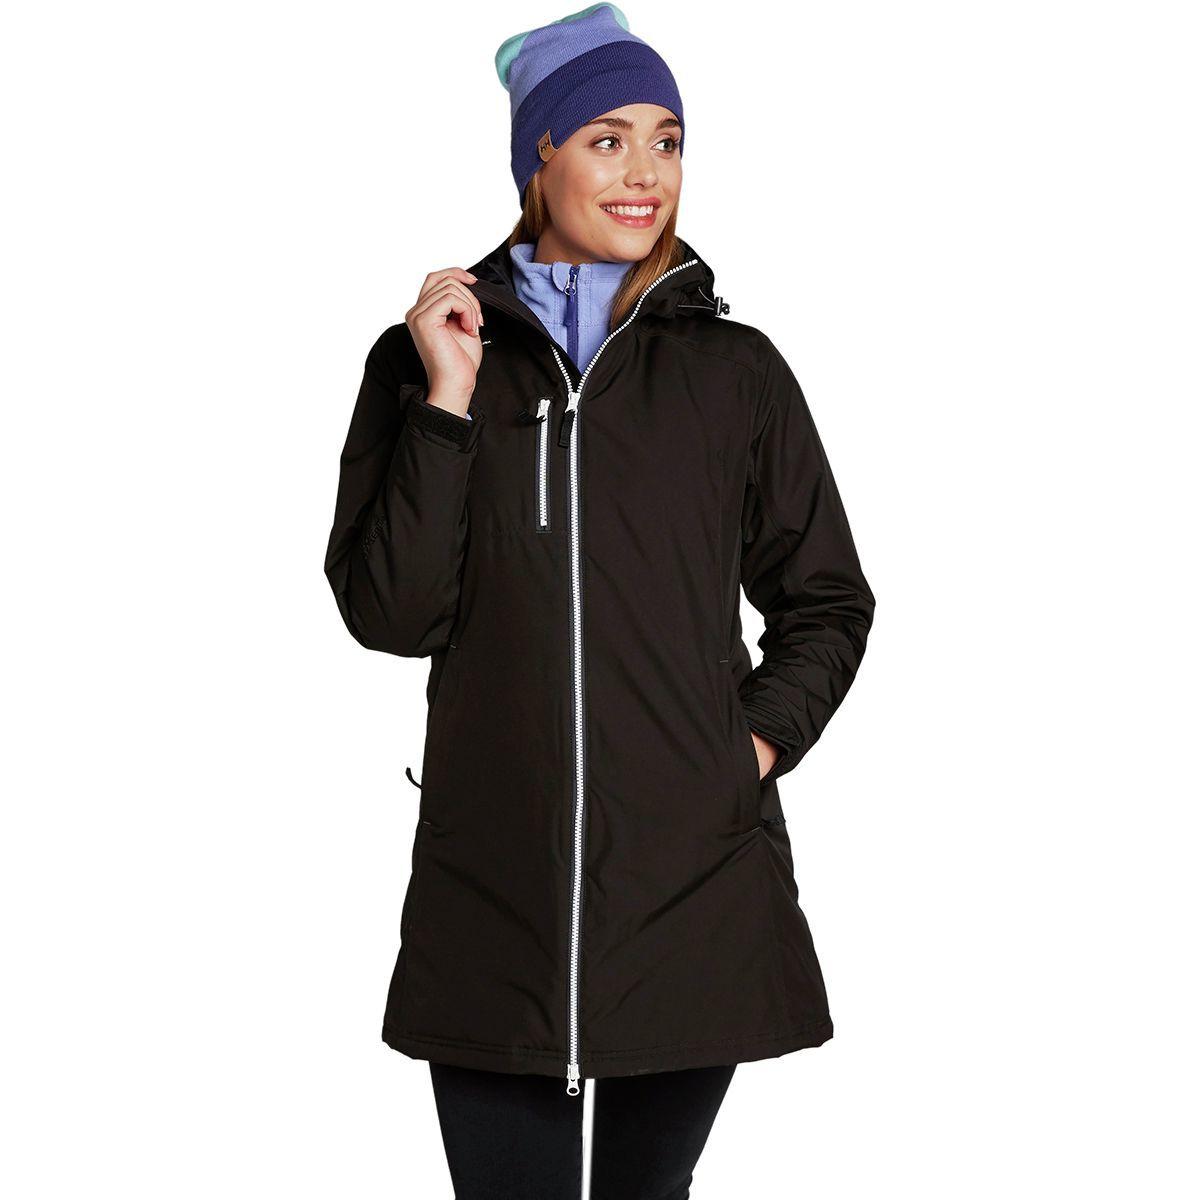 Helly Hansen Long Belfast Winter Insulated Jacket - Women's